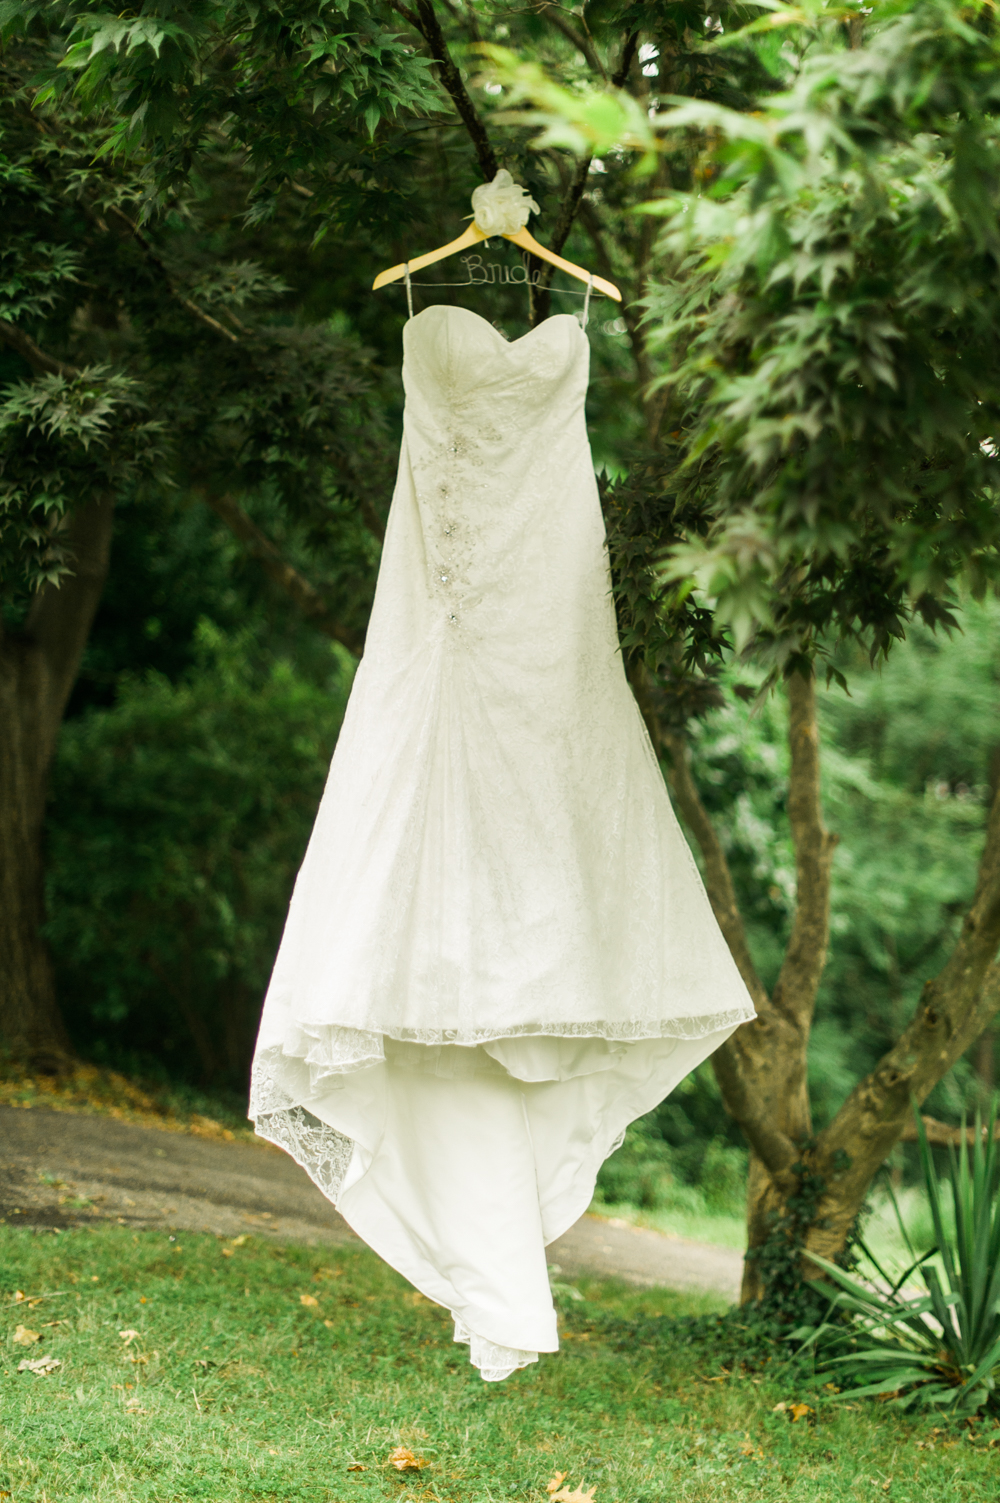 Mendenhall_Inn_Wedding_Pennsylvania_Rebecca_Watkins_Photography_2014-007.jpg